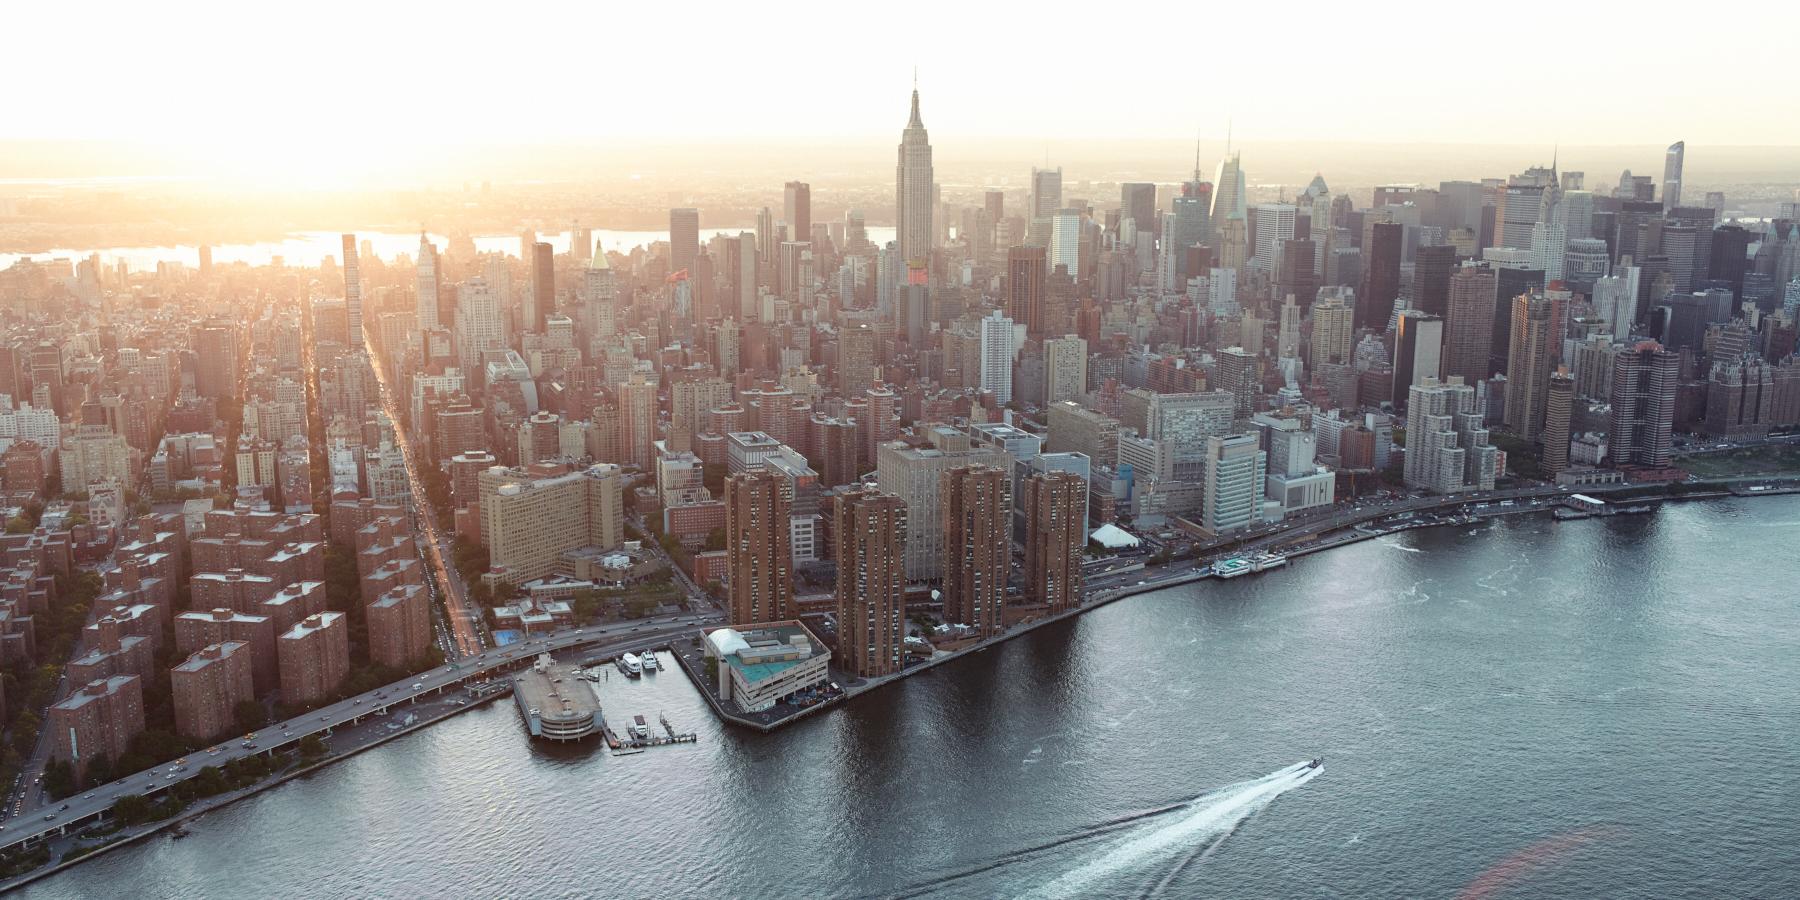 W01-140607_NYC_Aerials_044.jpg